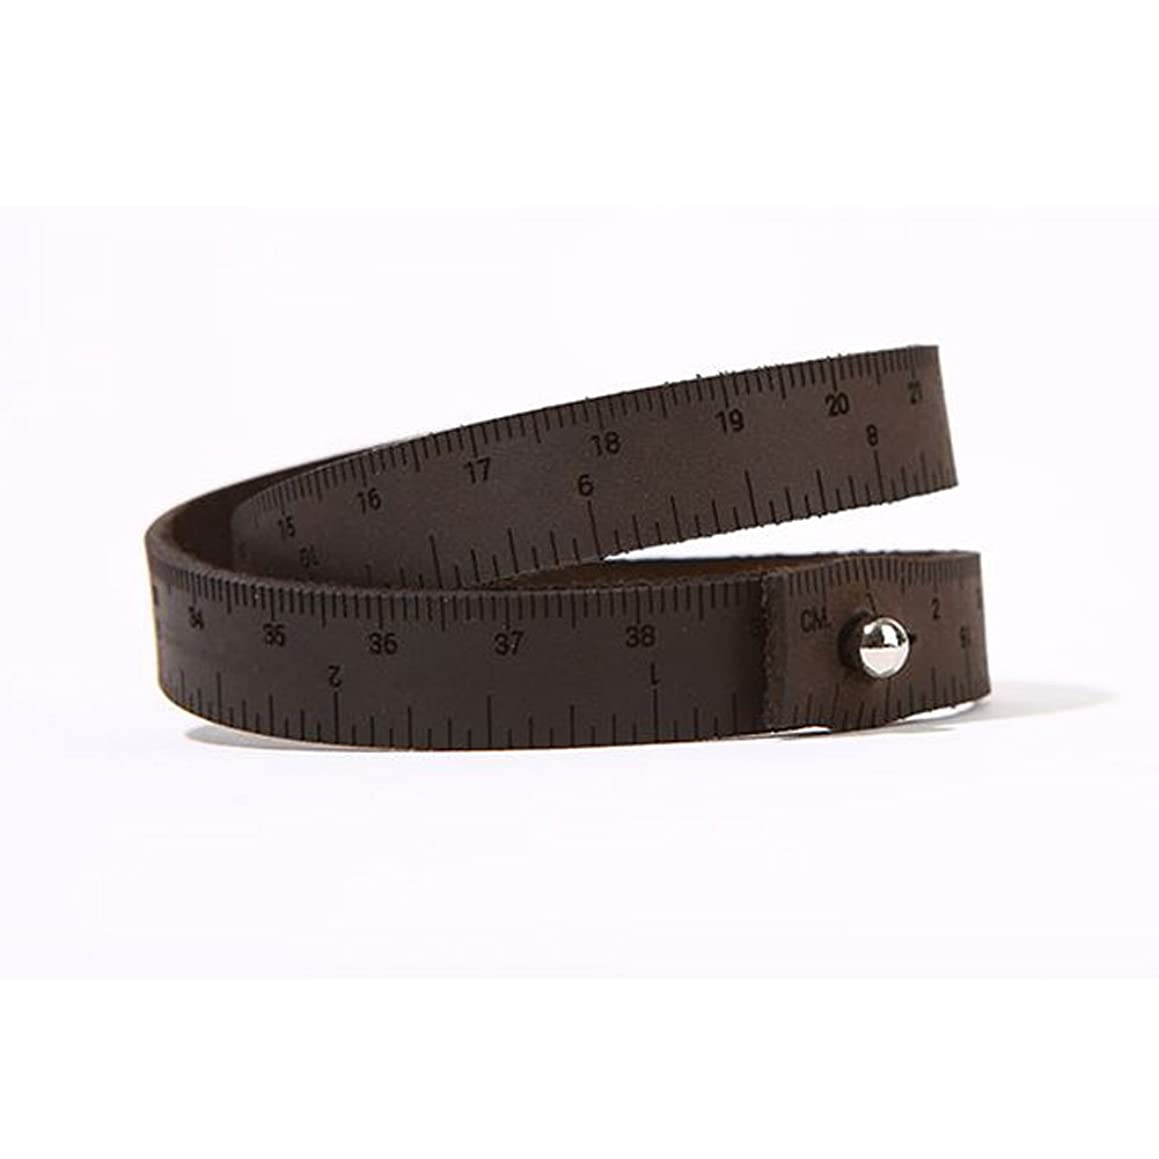 ILOVEHANDLES Leather Wrist Ruler - 16